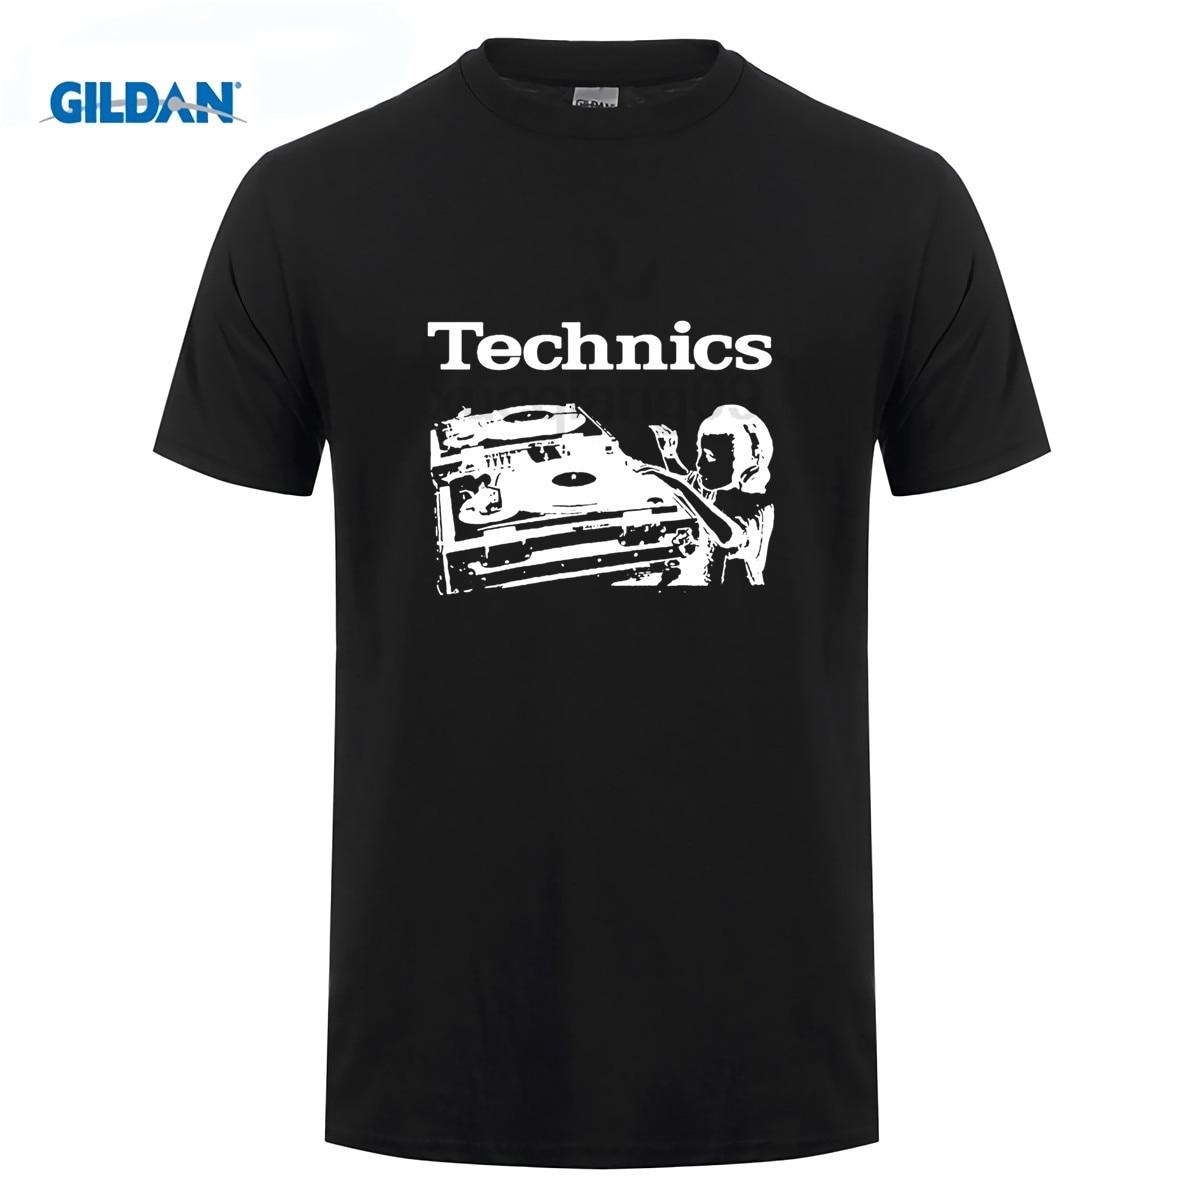 Nieuwe Merk T Shirt Mannen Korte Mouw Technics Shirt